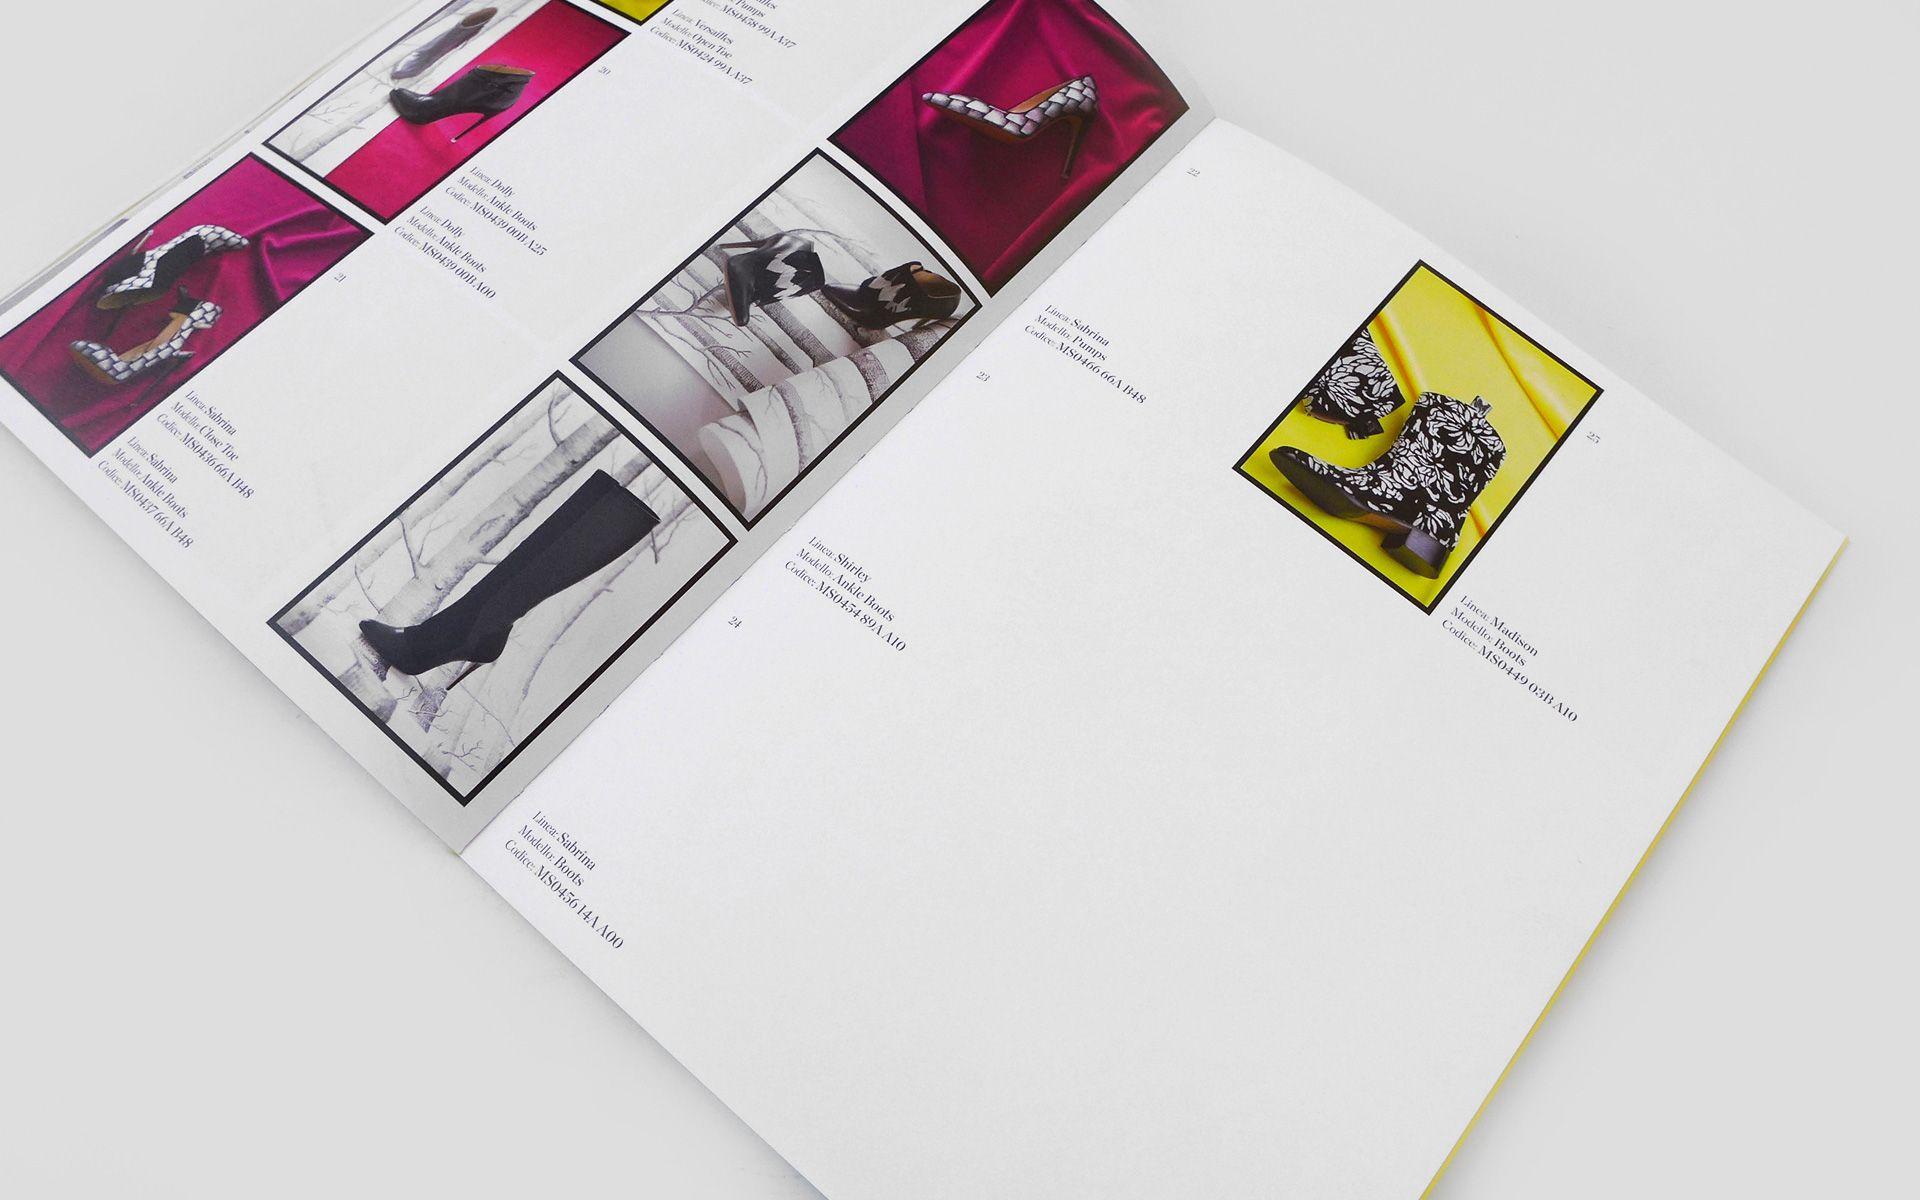 Catalog - Fall Winter 2014/15